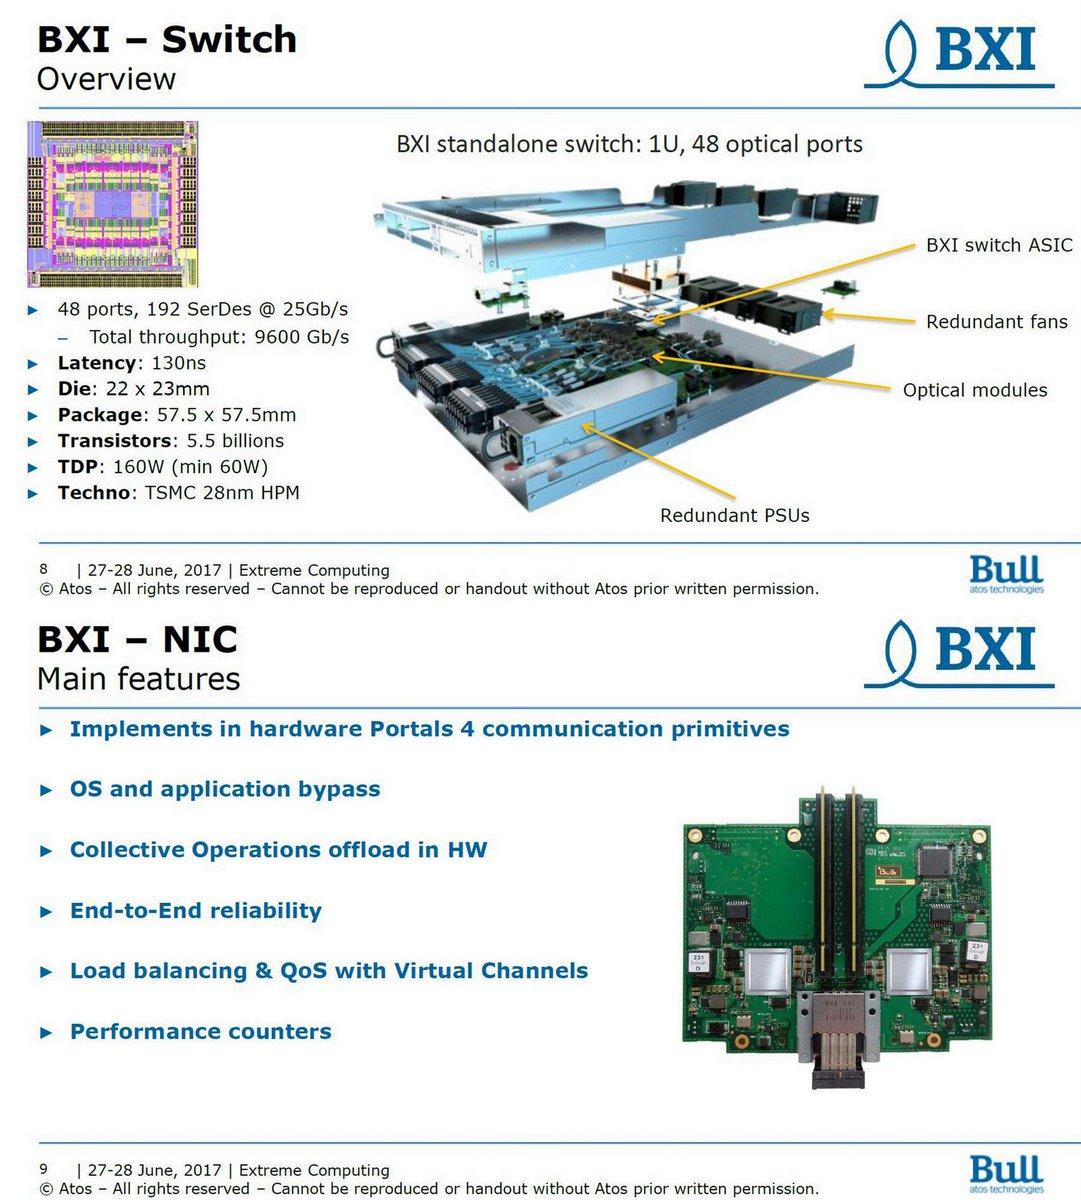 Ogawa Tadashi On Twitter Bxi Boost Hpc Application Largest Fpga 68 Billion Transistors Performance Thanks To Hardware Offload Bull Teratec Forum Jun 28 2017 Pdf